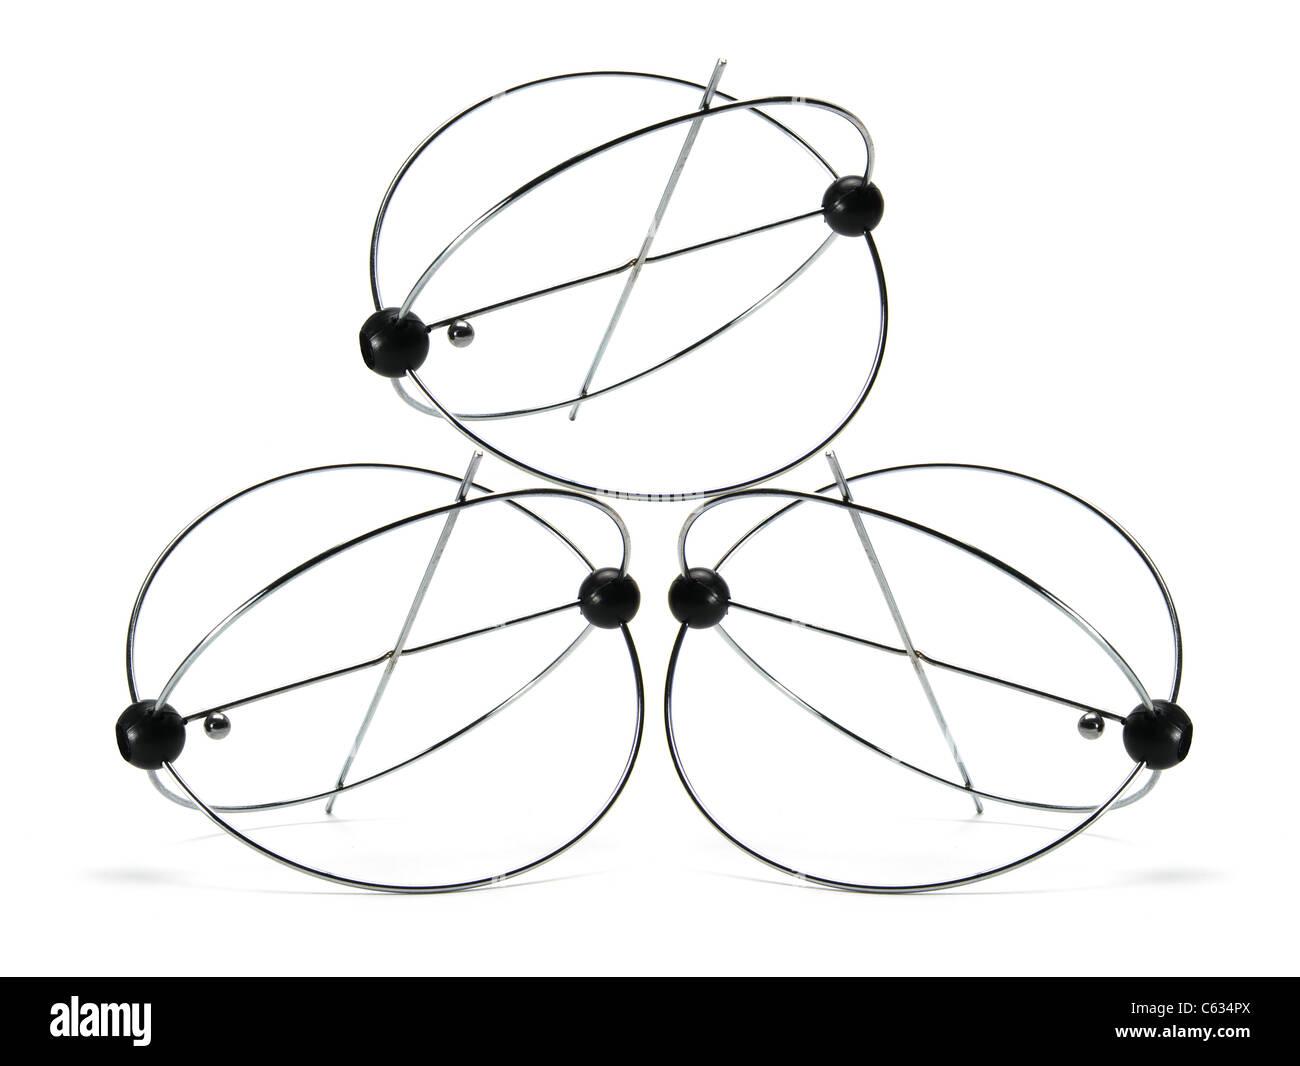 Kinetic Motion Toys - Stock Image